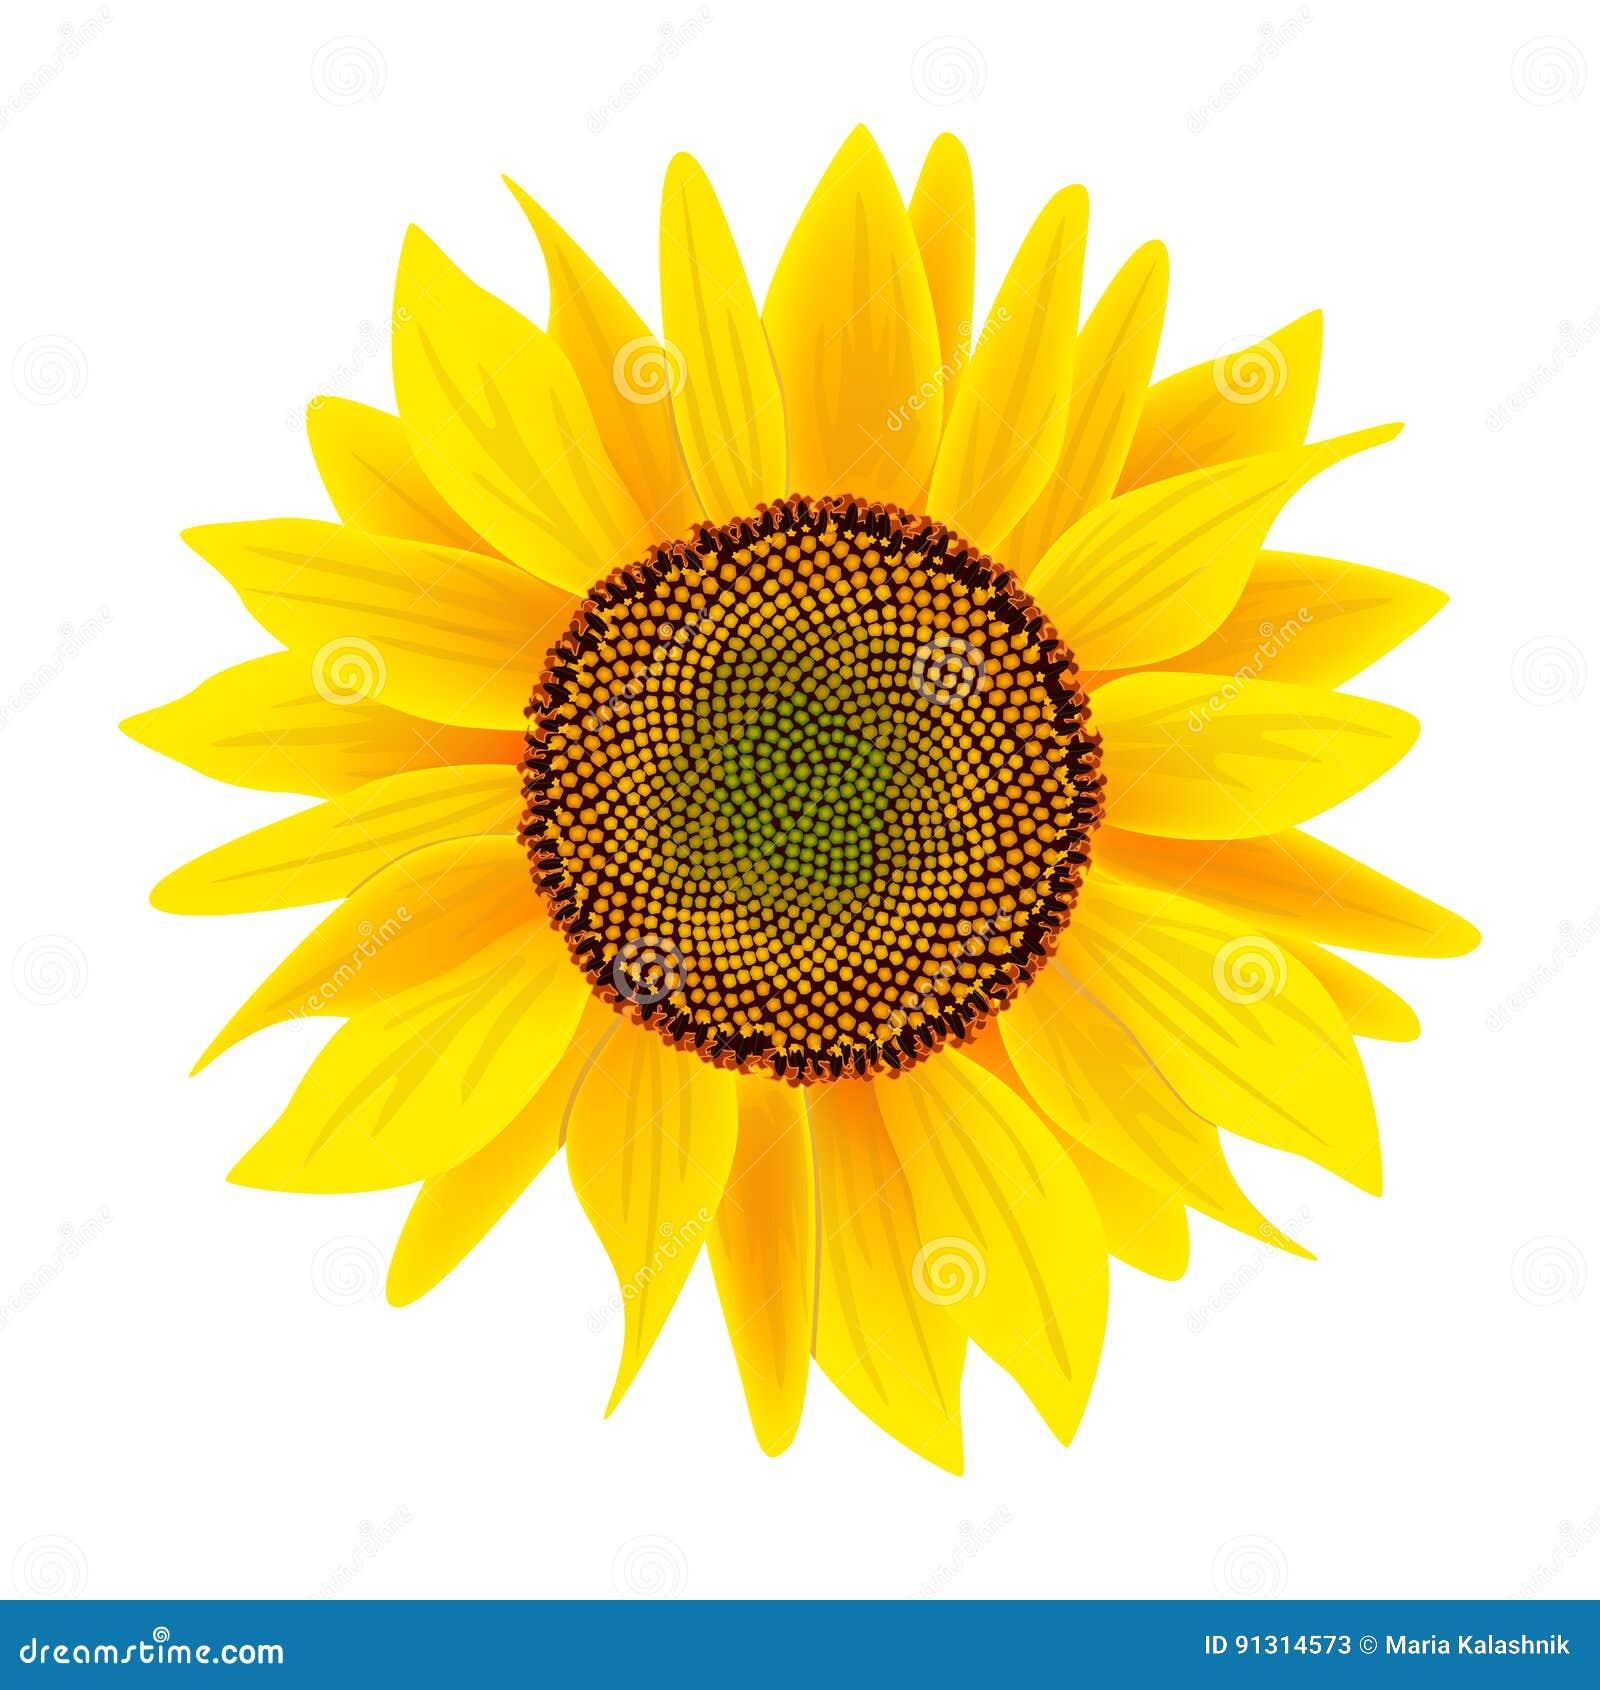 Flor Ou Helianthus Do Girassol Isolada No Fundo Branco Ilustracao